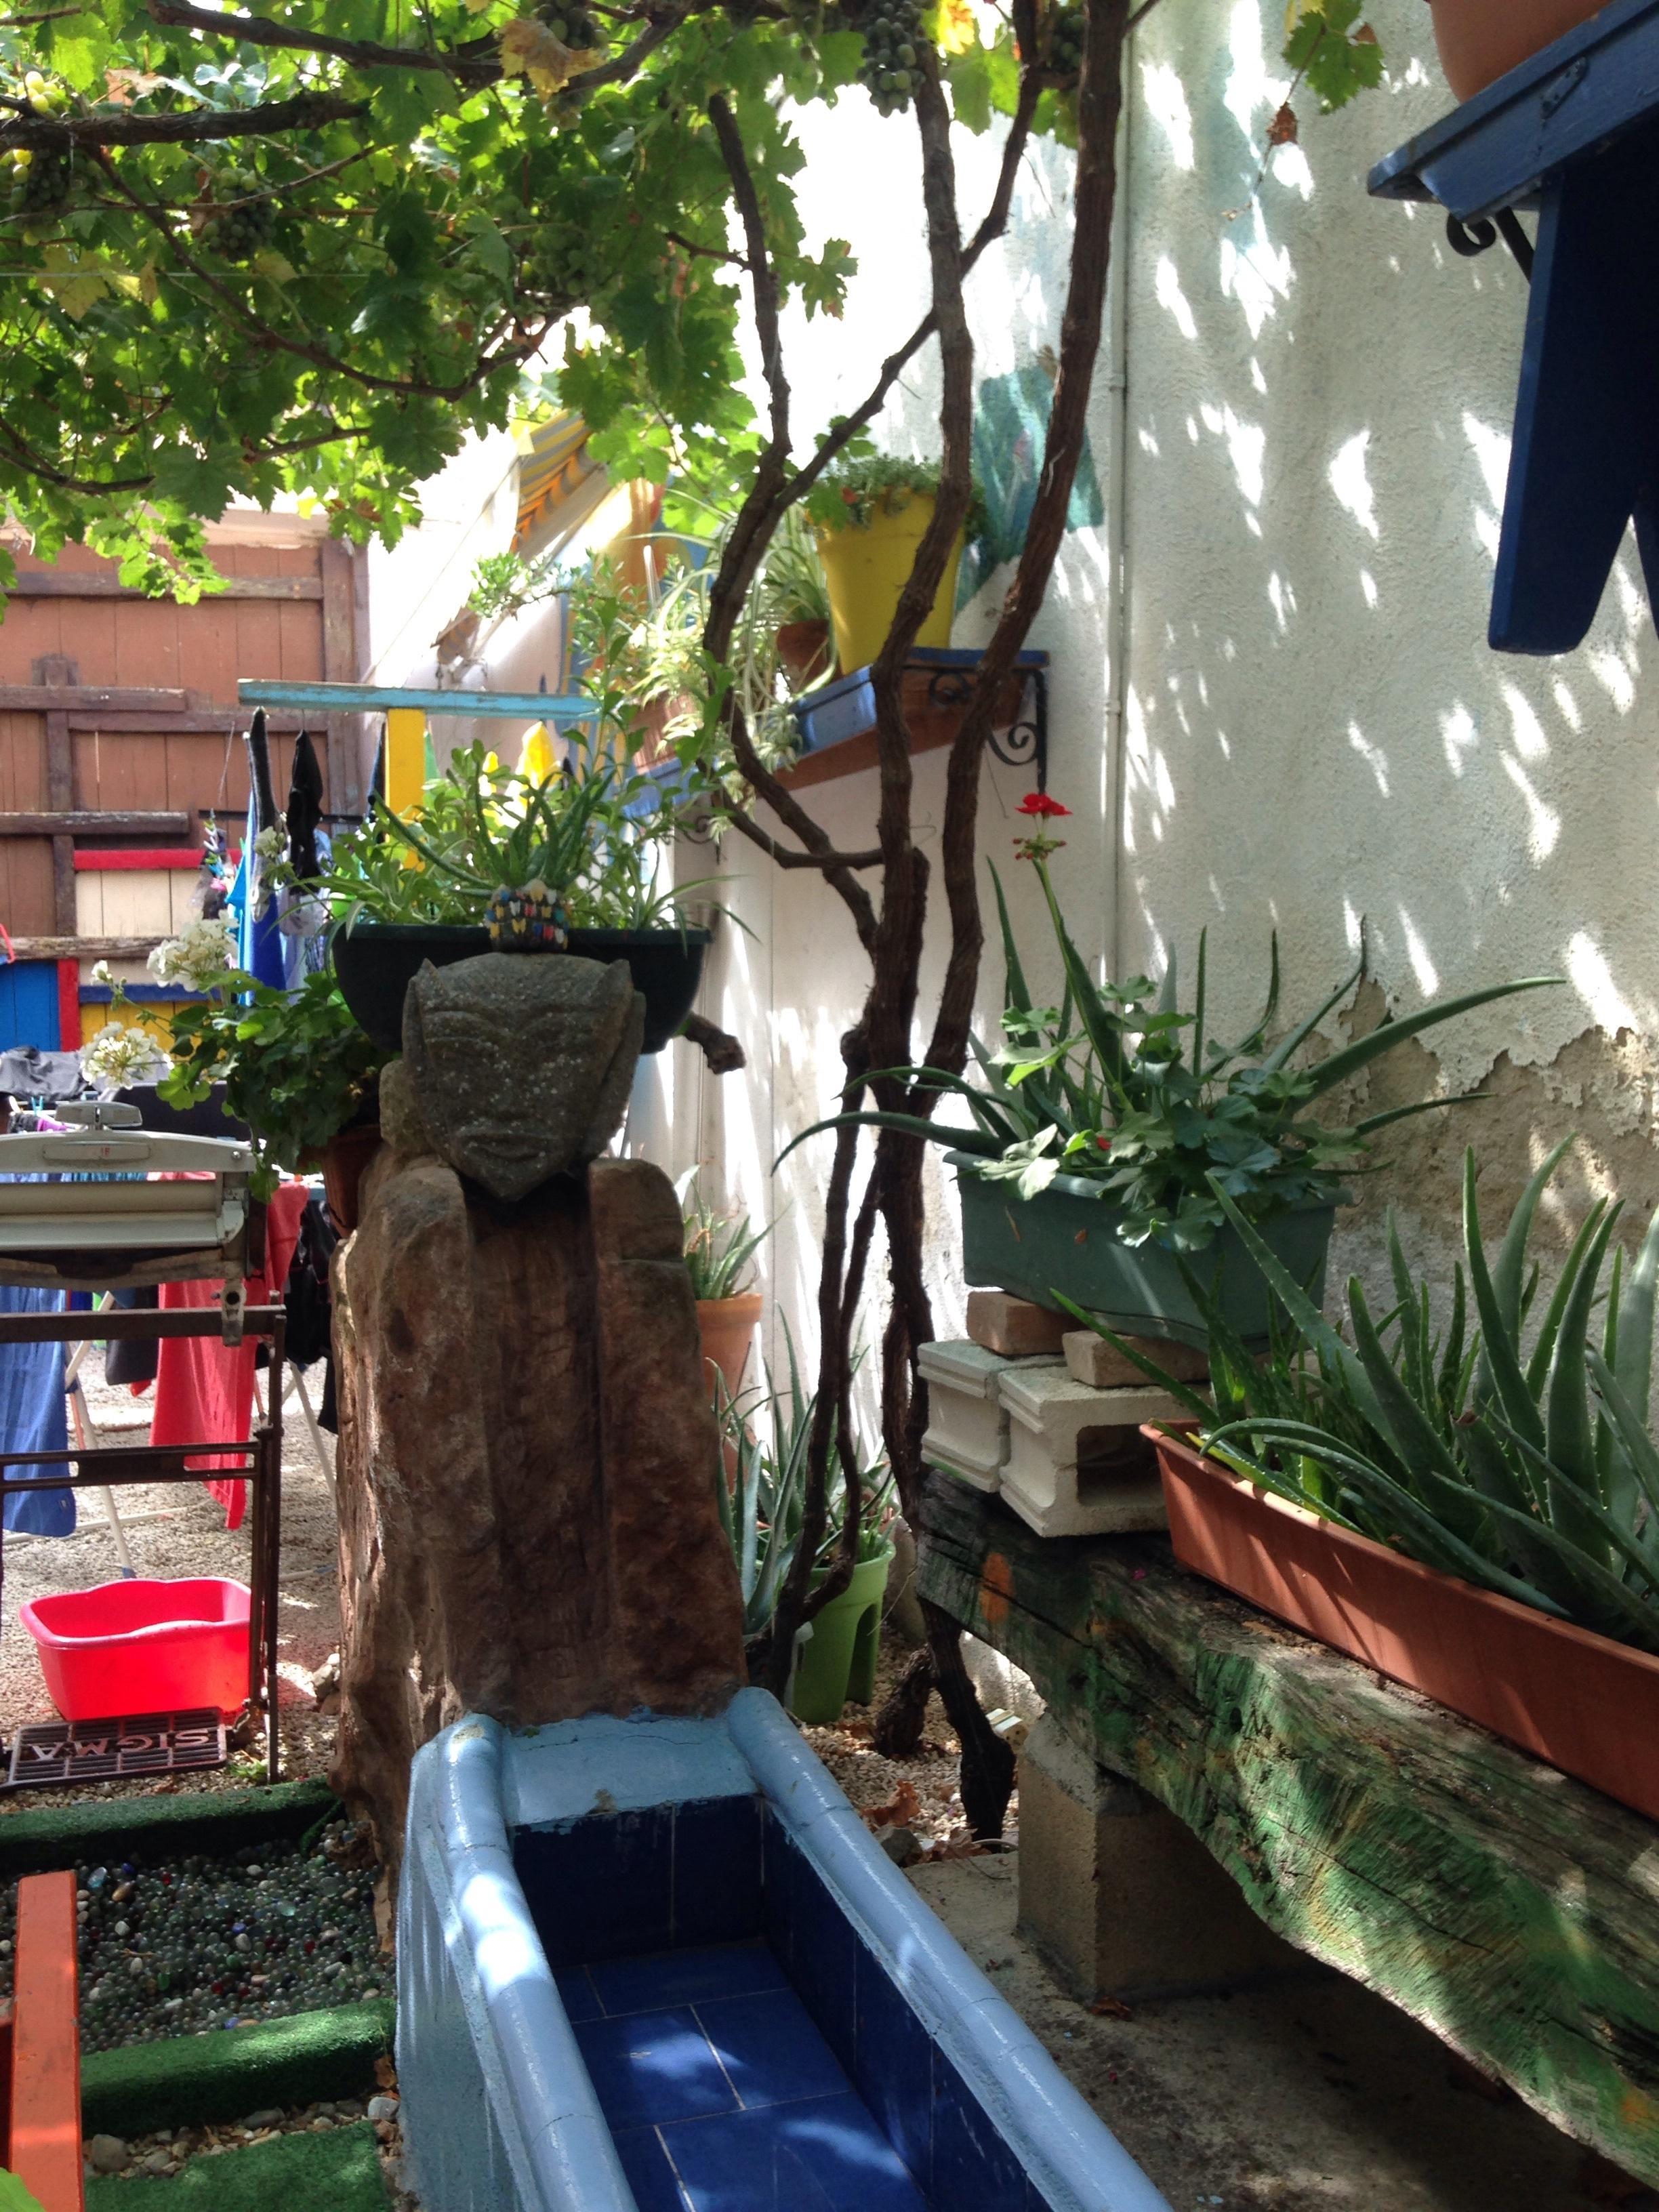 restful aubergue garden in los arcos